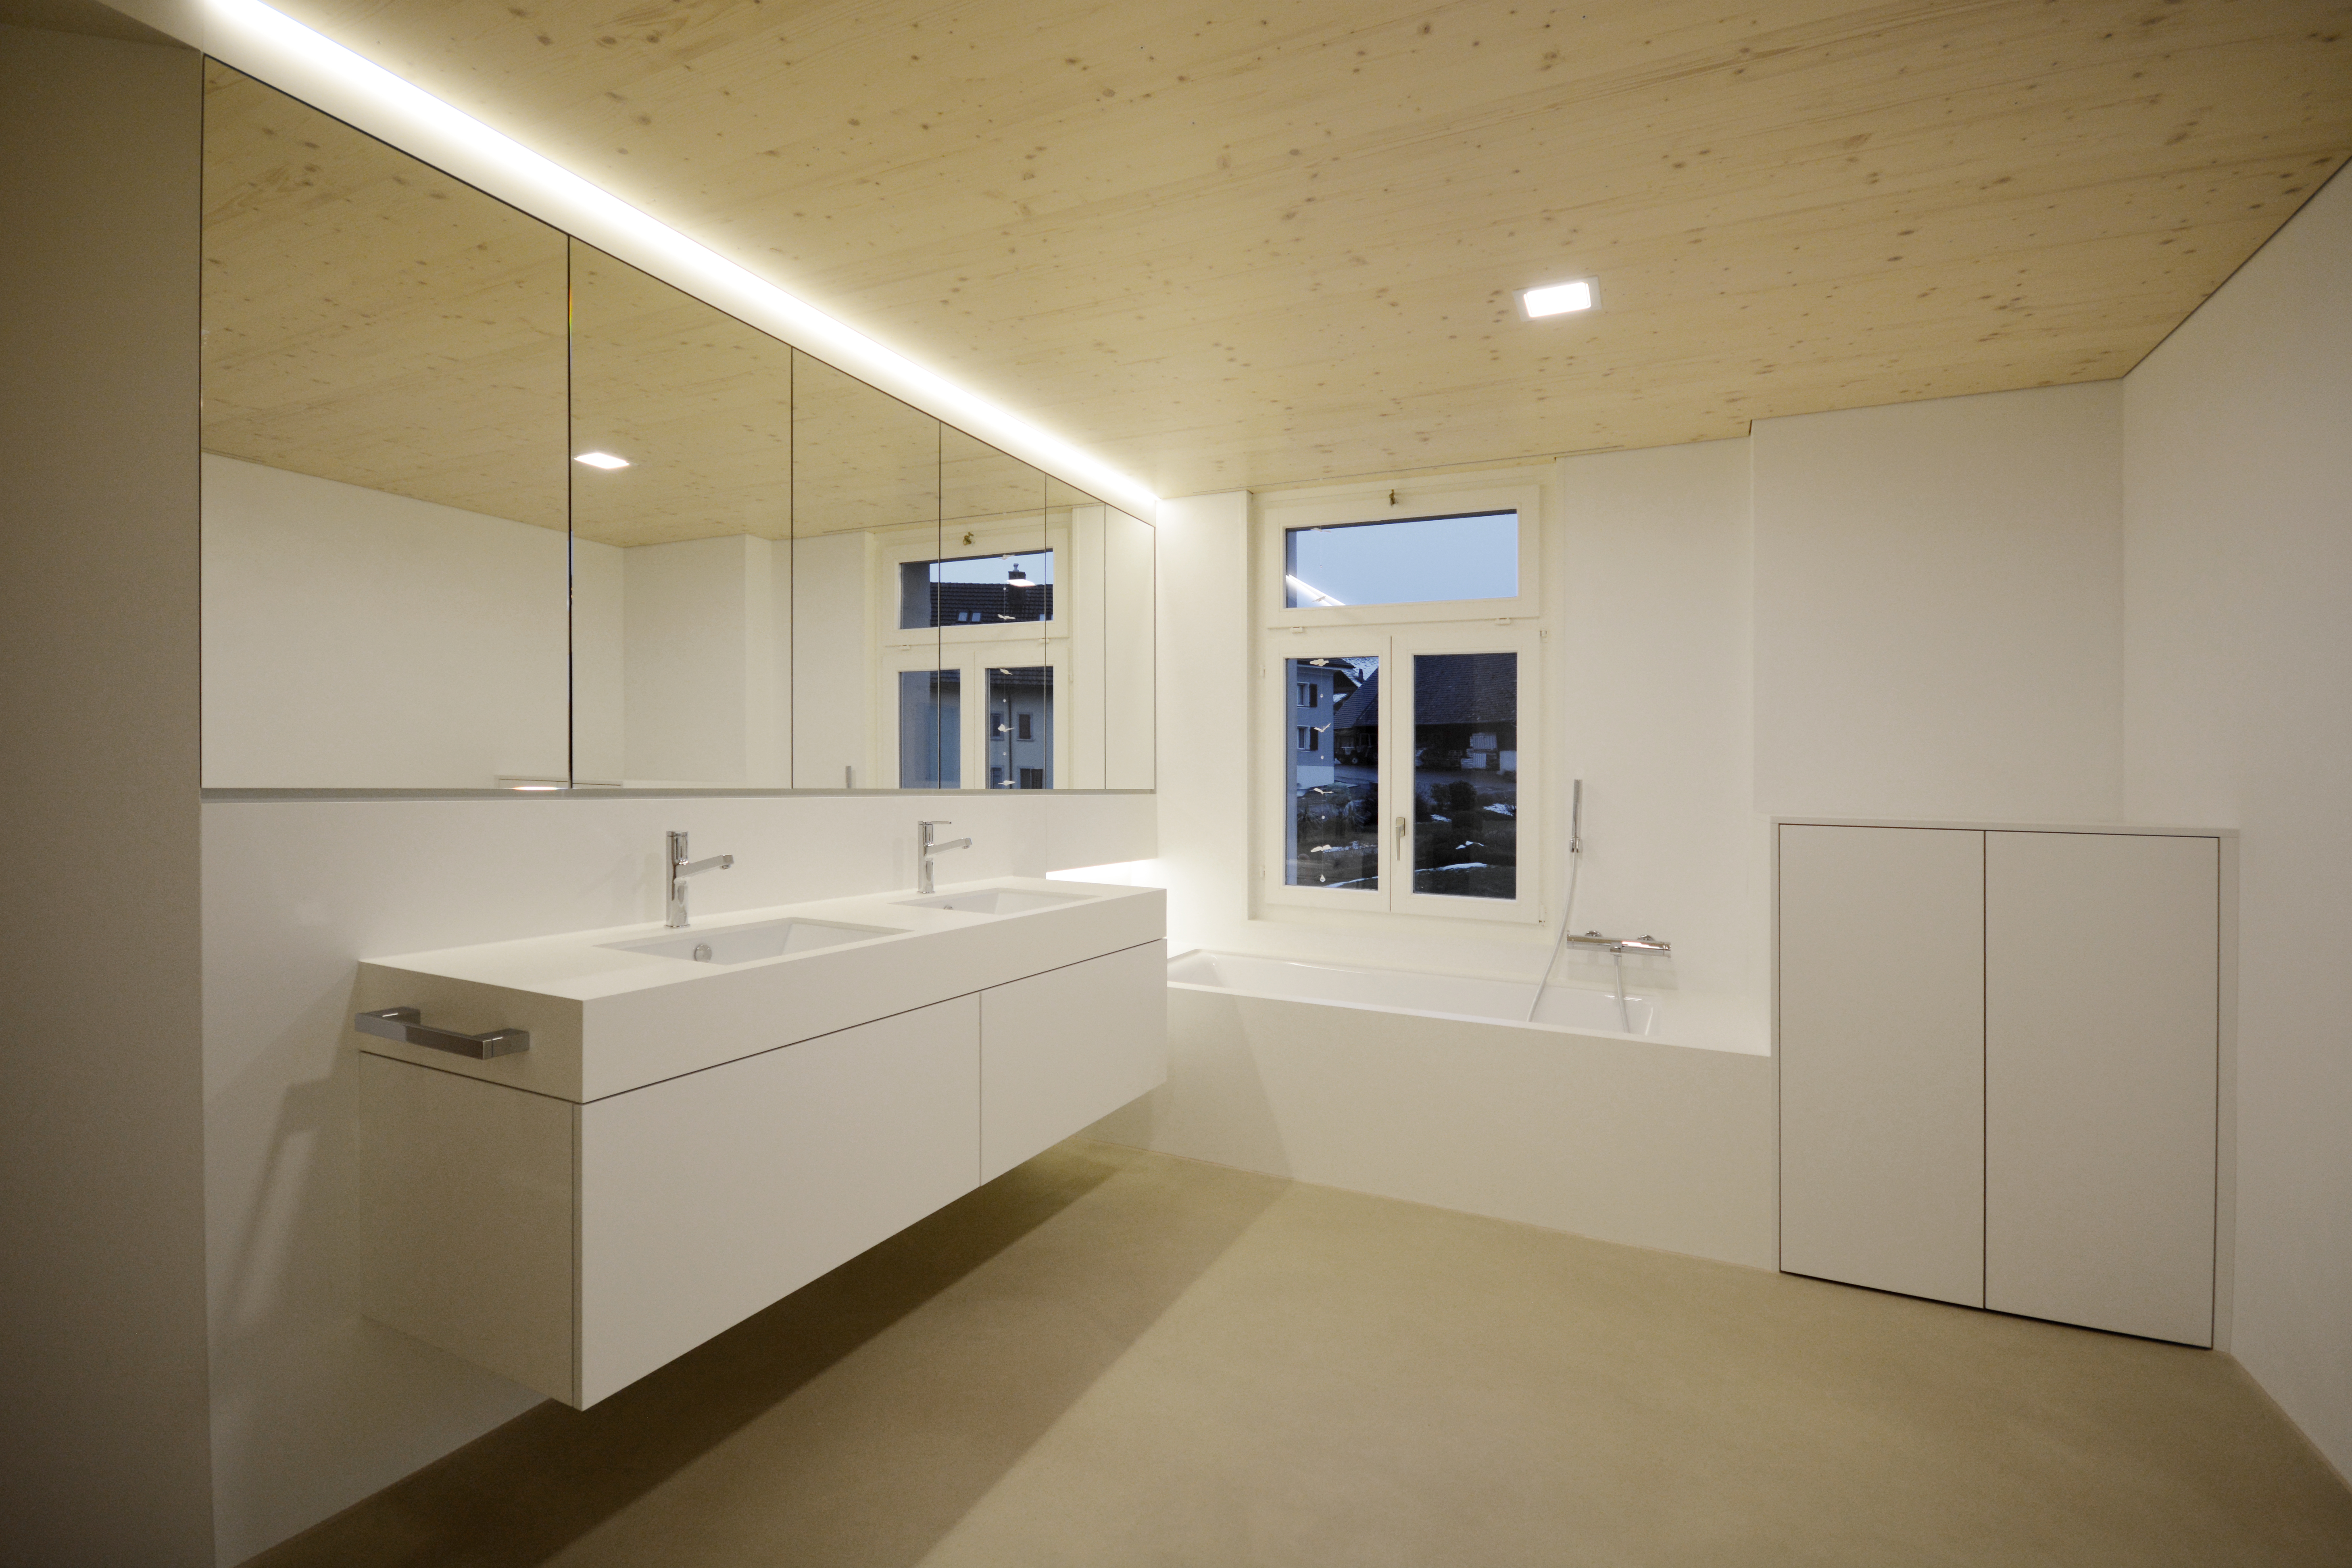 Wohnung m hlau innenarchitektur leitgedanke projekte for Innenarchitektur wohnung